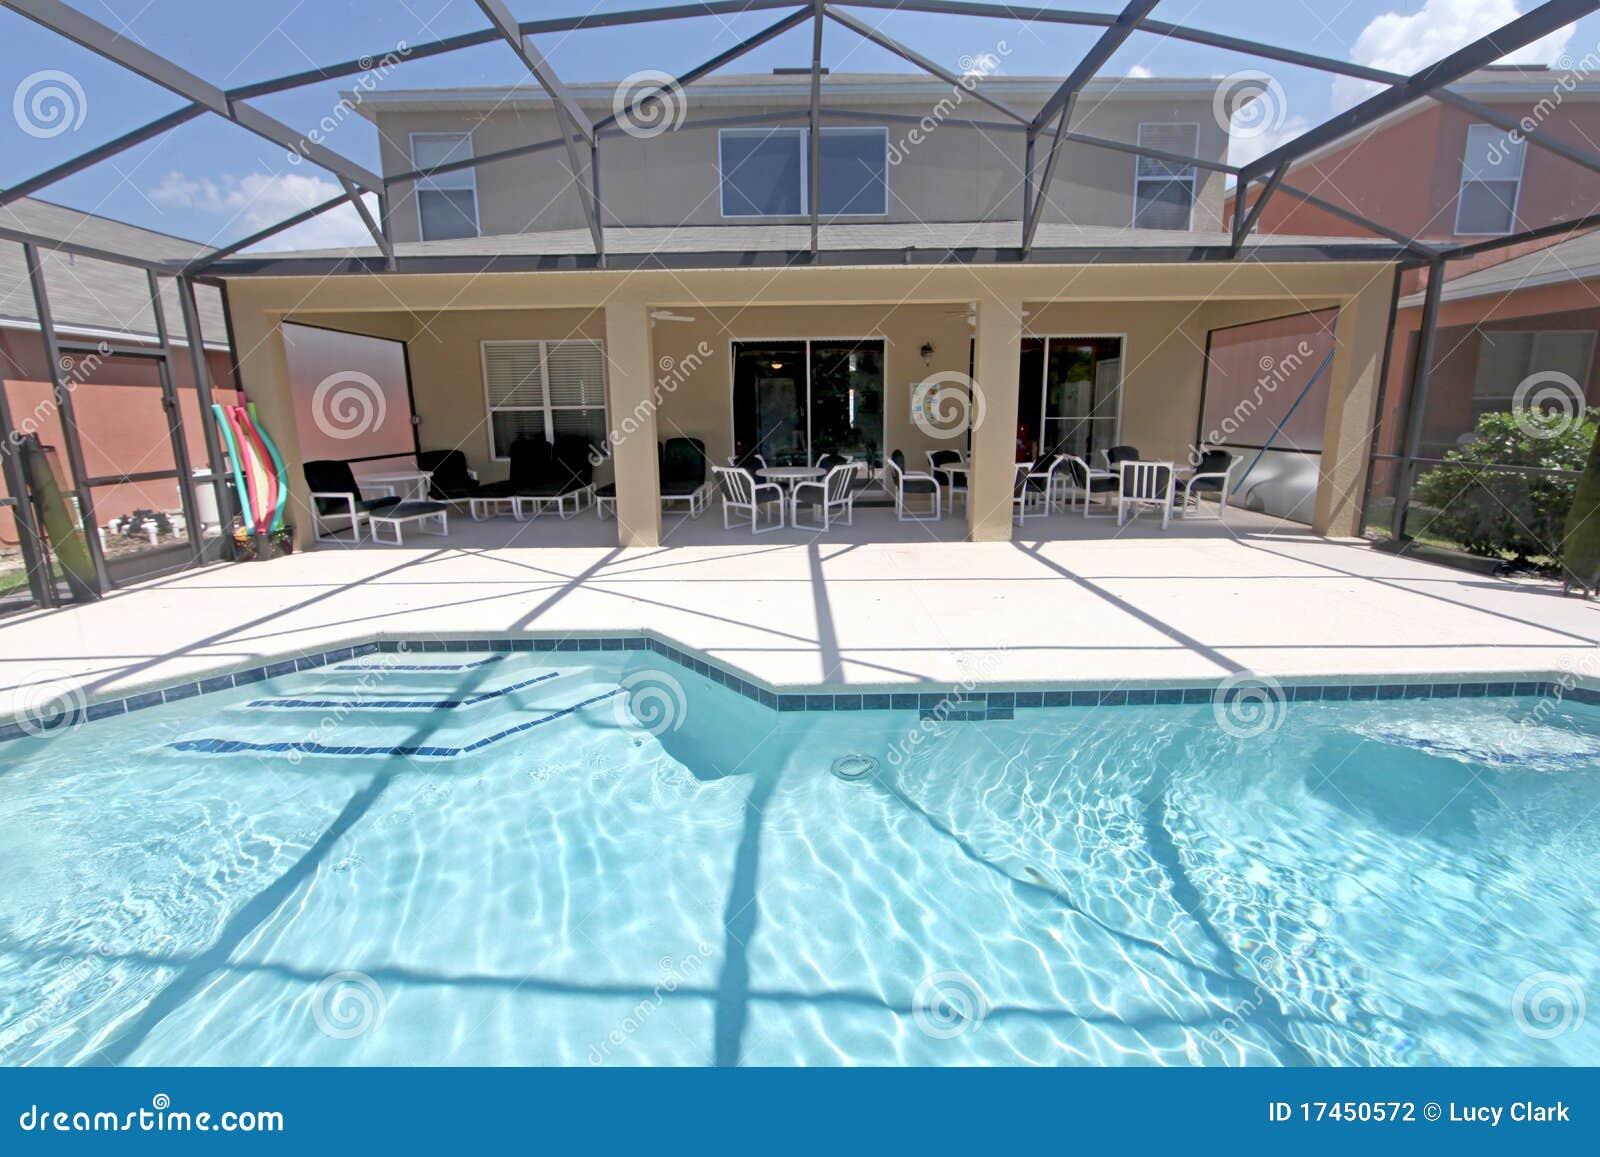 Pool And Lanai Stock Photography Image 17450572